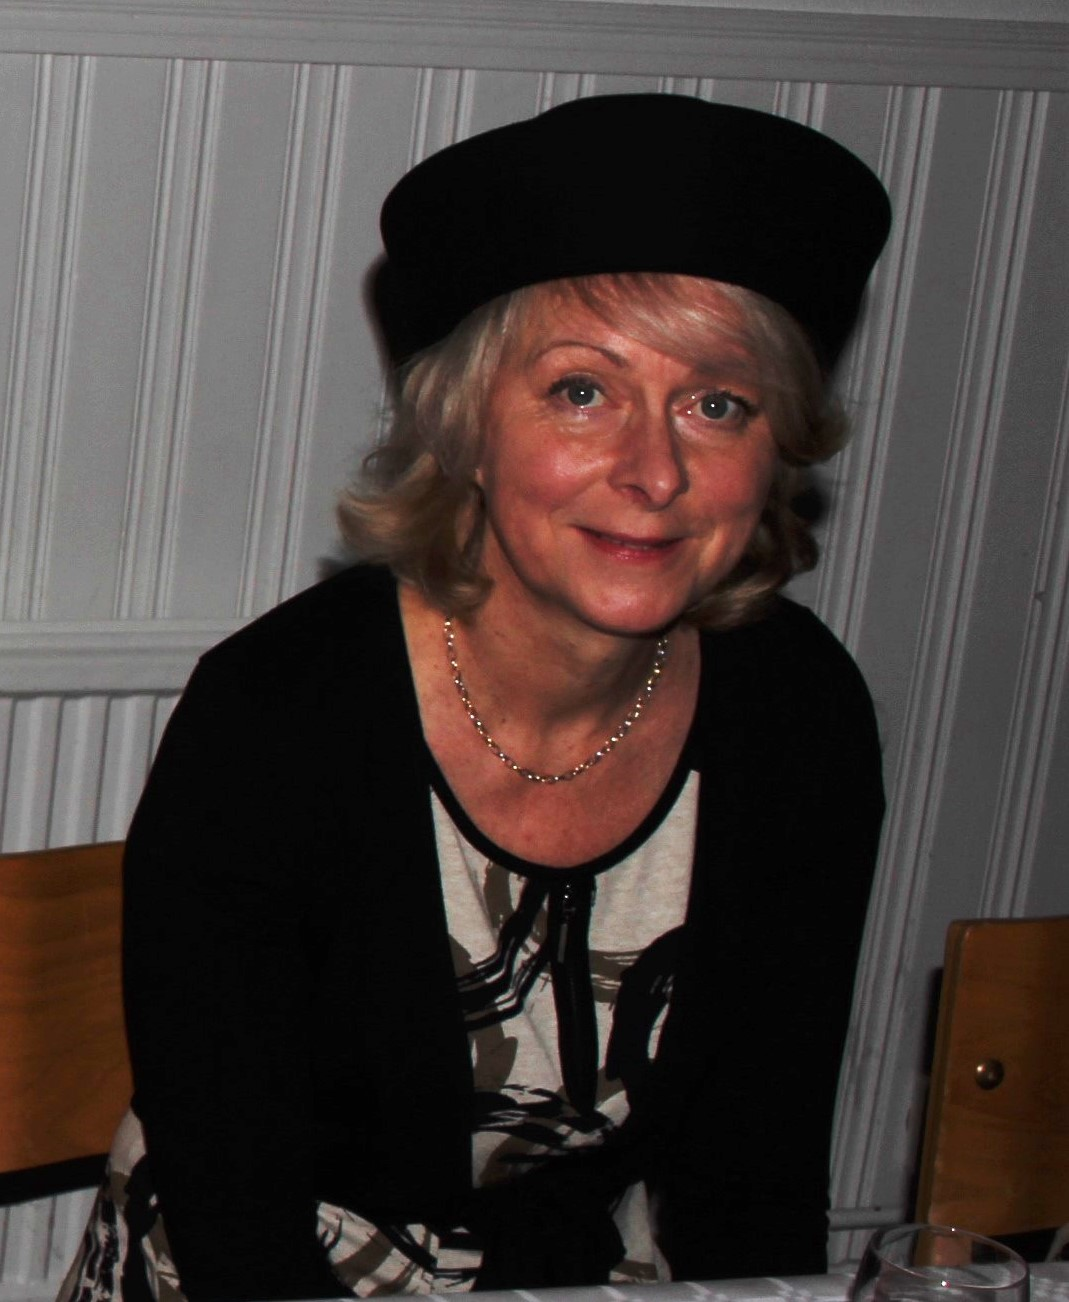 Karin ordförande i Falkenbergs FUB